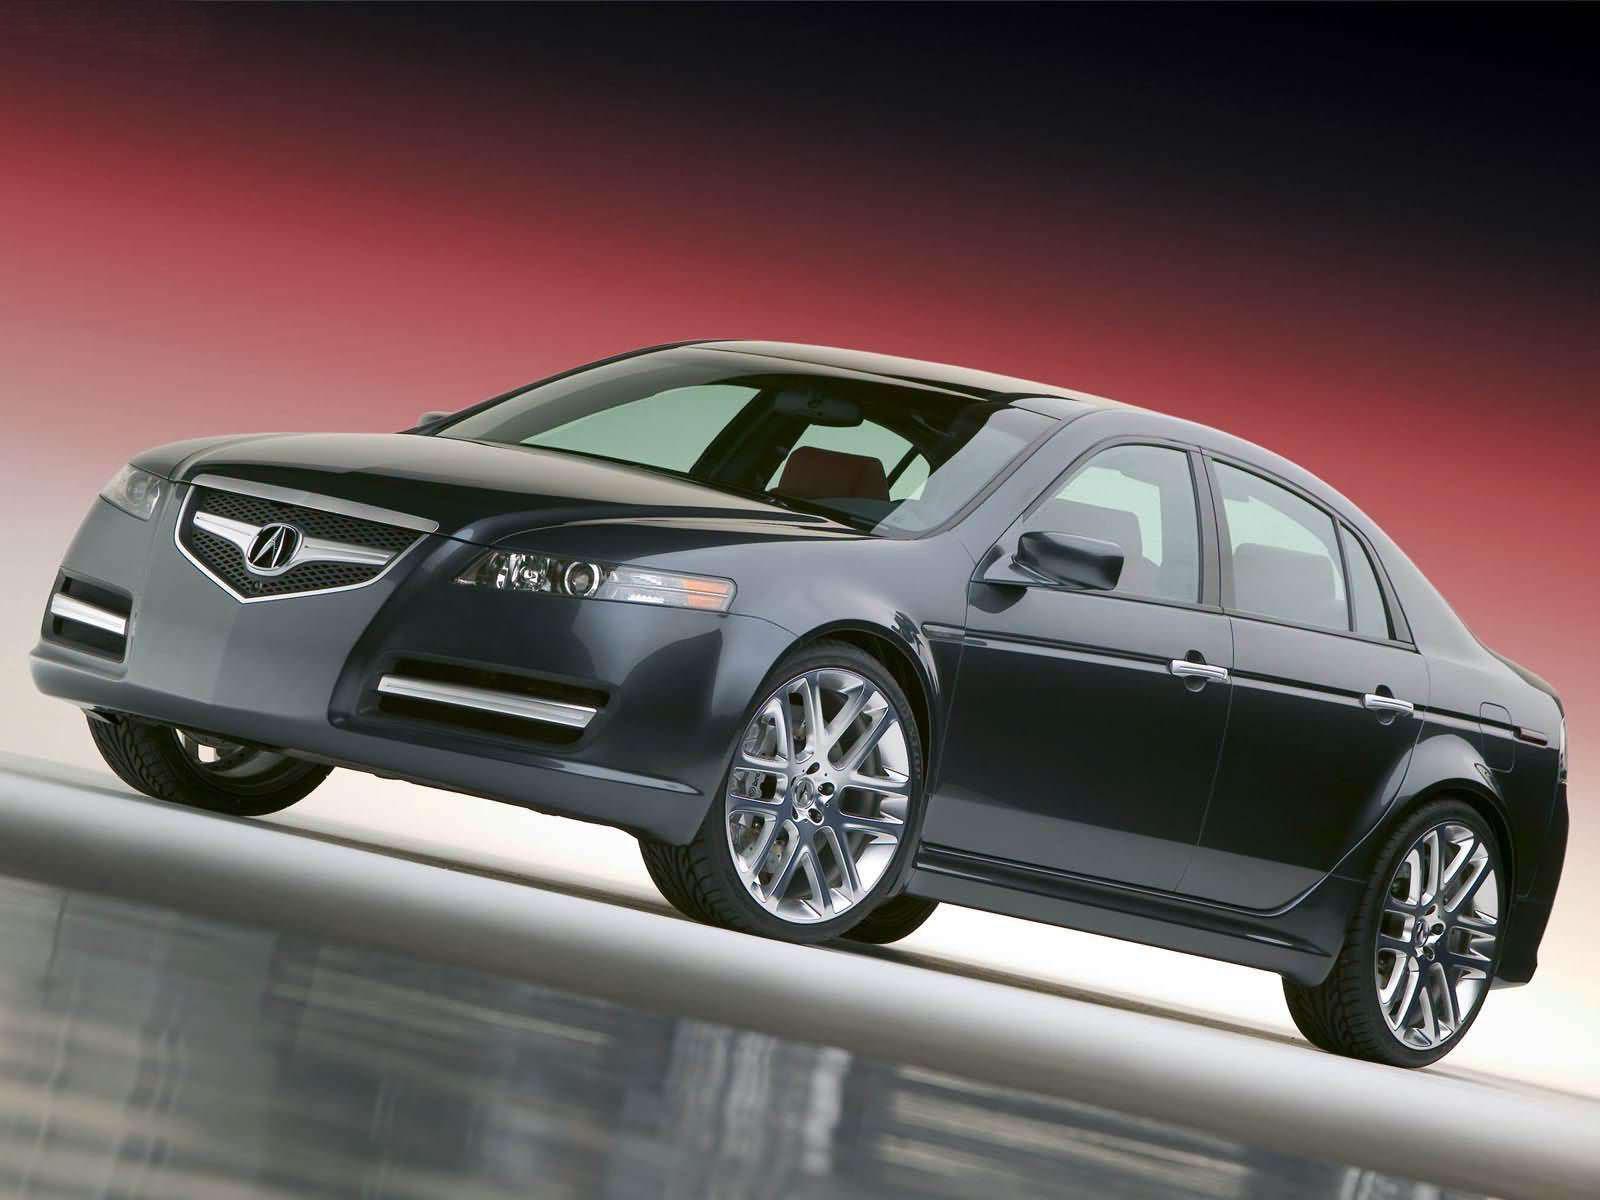 2003 acura tl aspec concept insurance information 2005 Acura TL Cold Air Intake Acura TL Air Intake